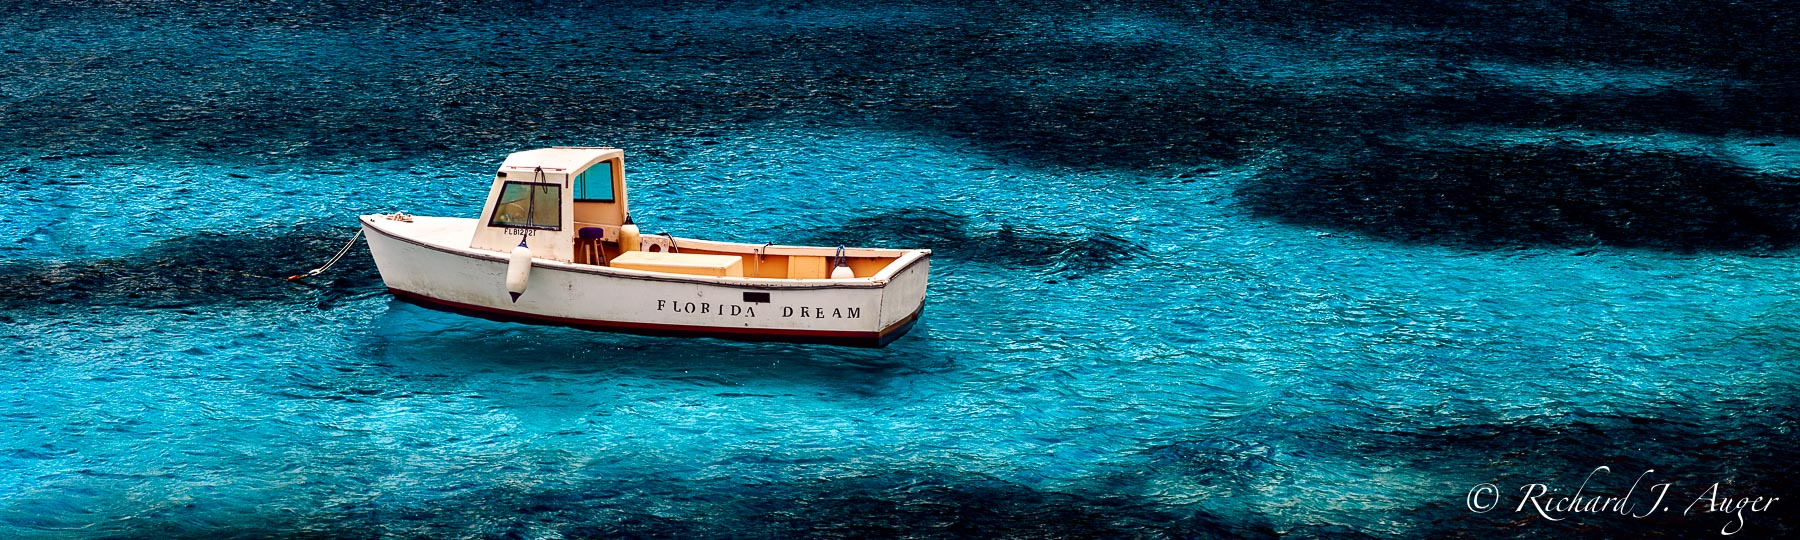 Florida Dream, Fishing Boat, Blue Water, Coastal